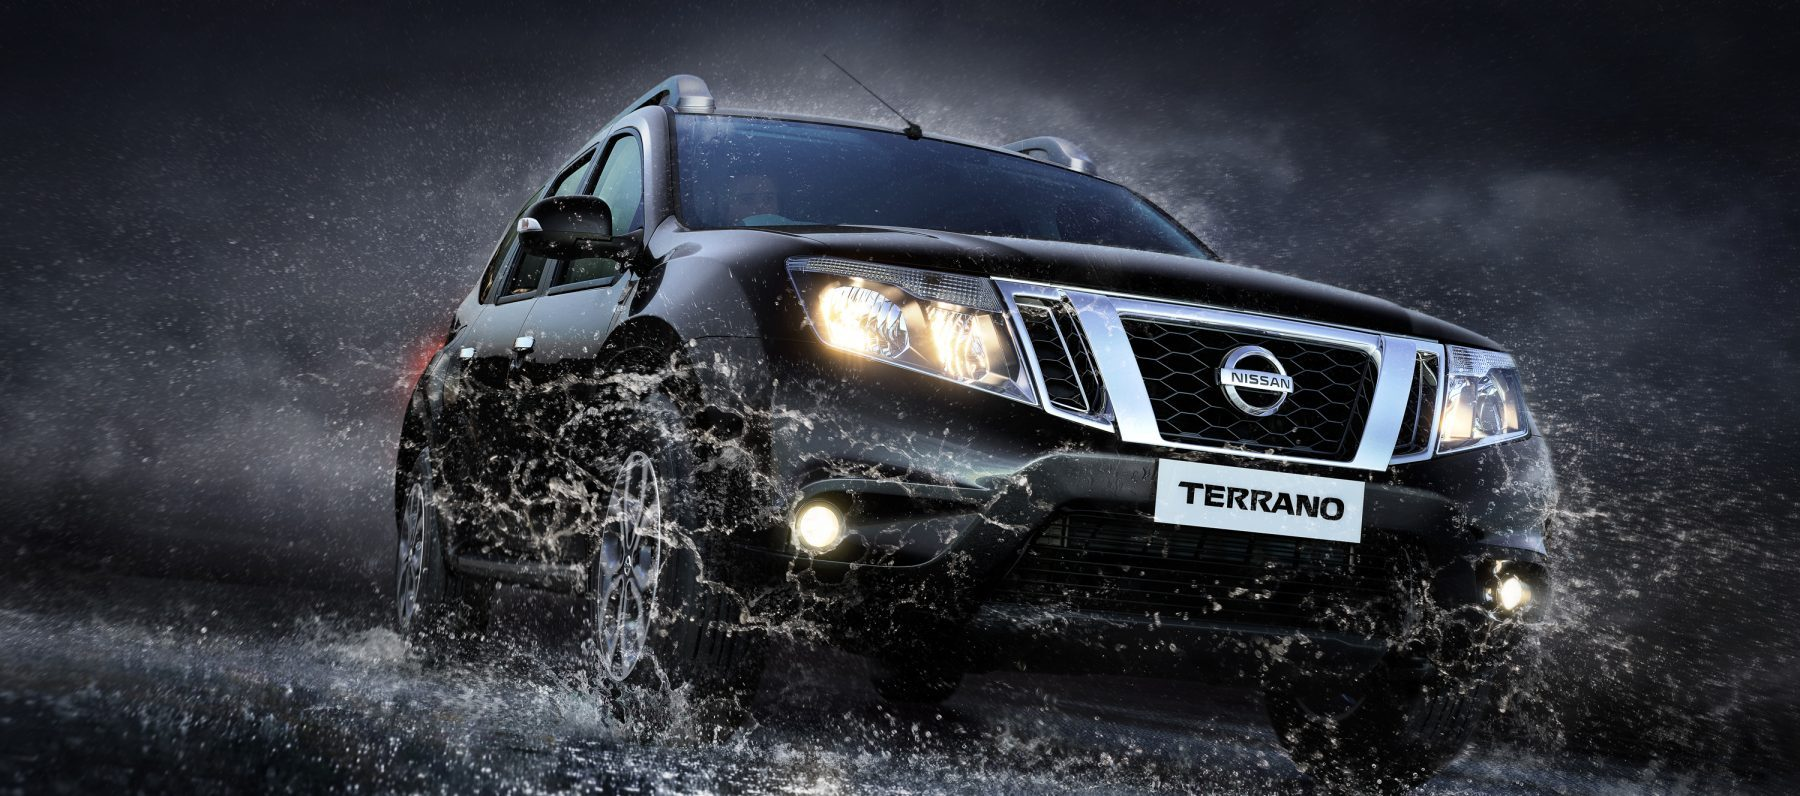 Nissan Terrano Price in Nepal